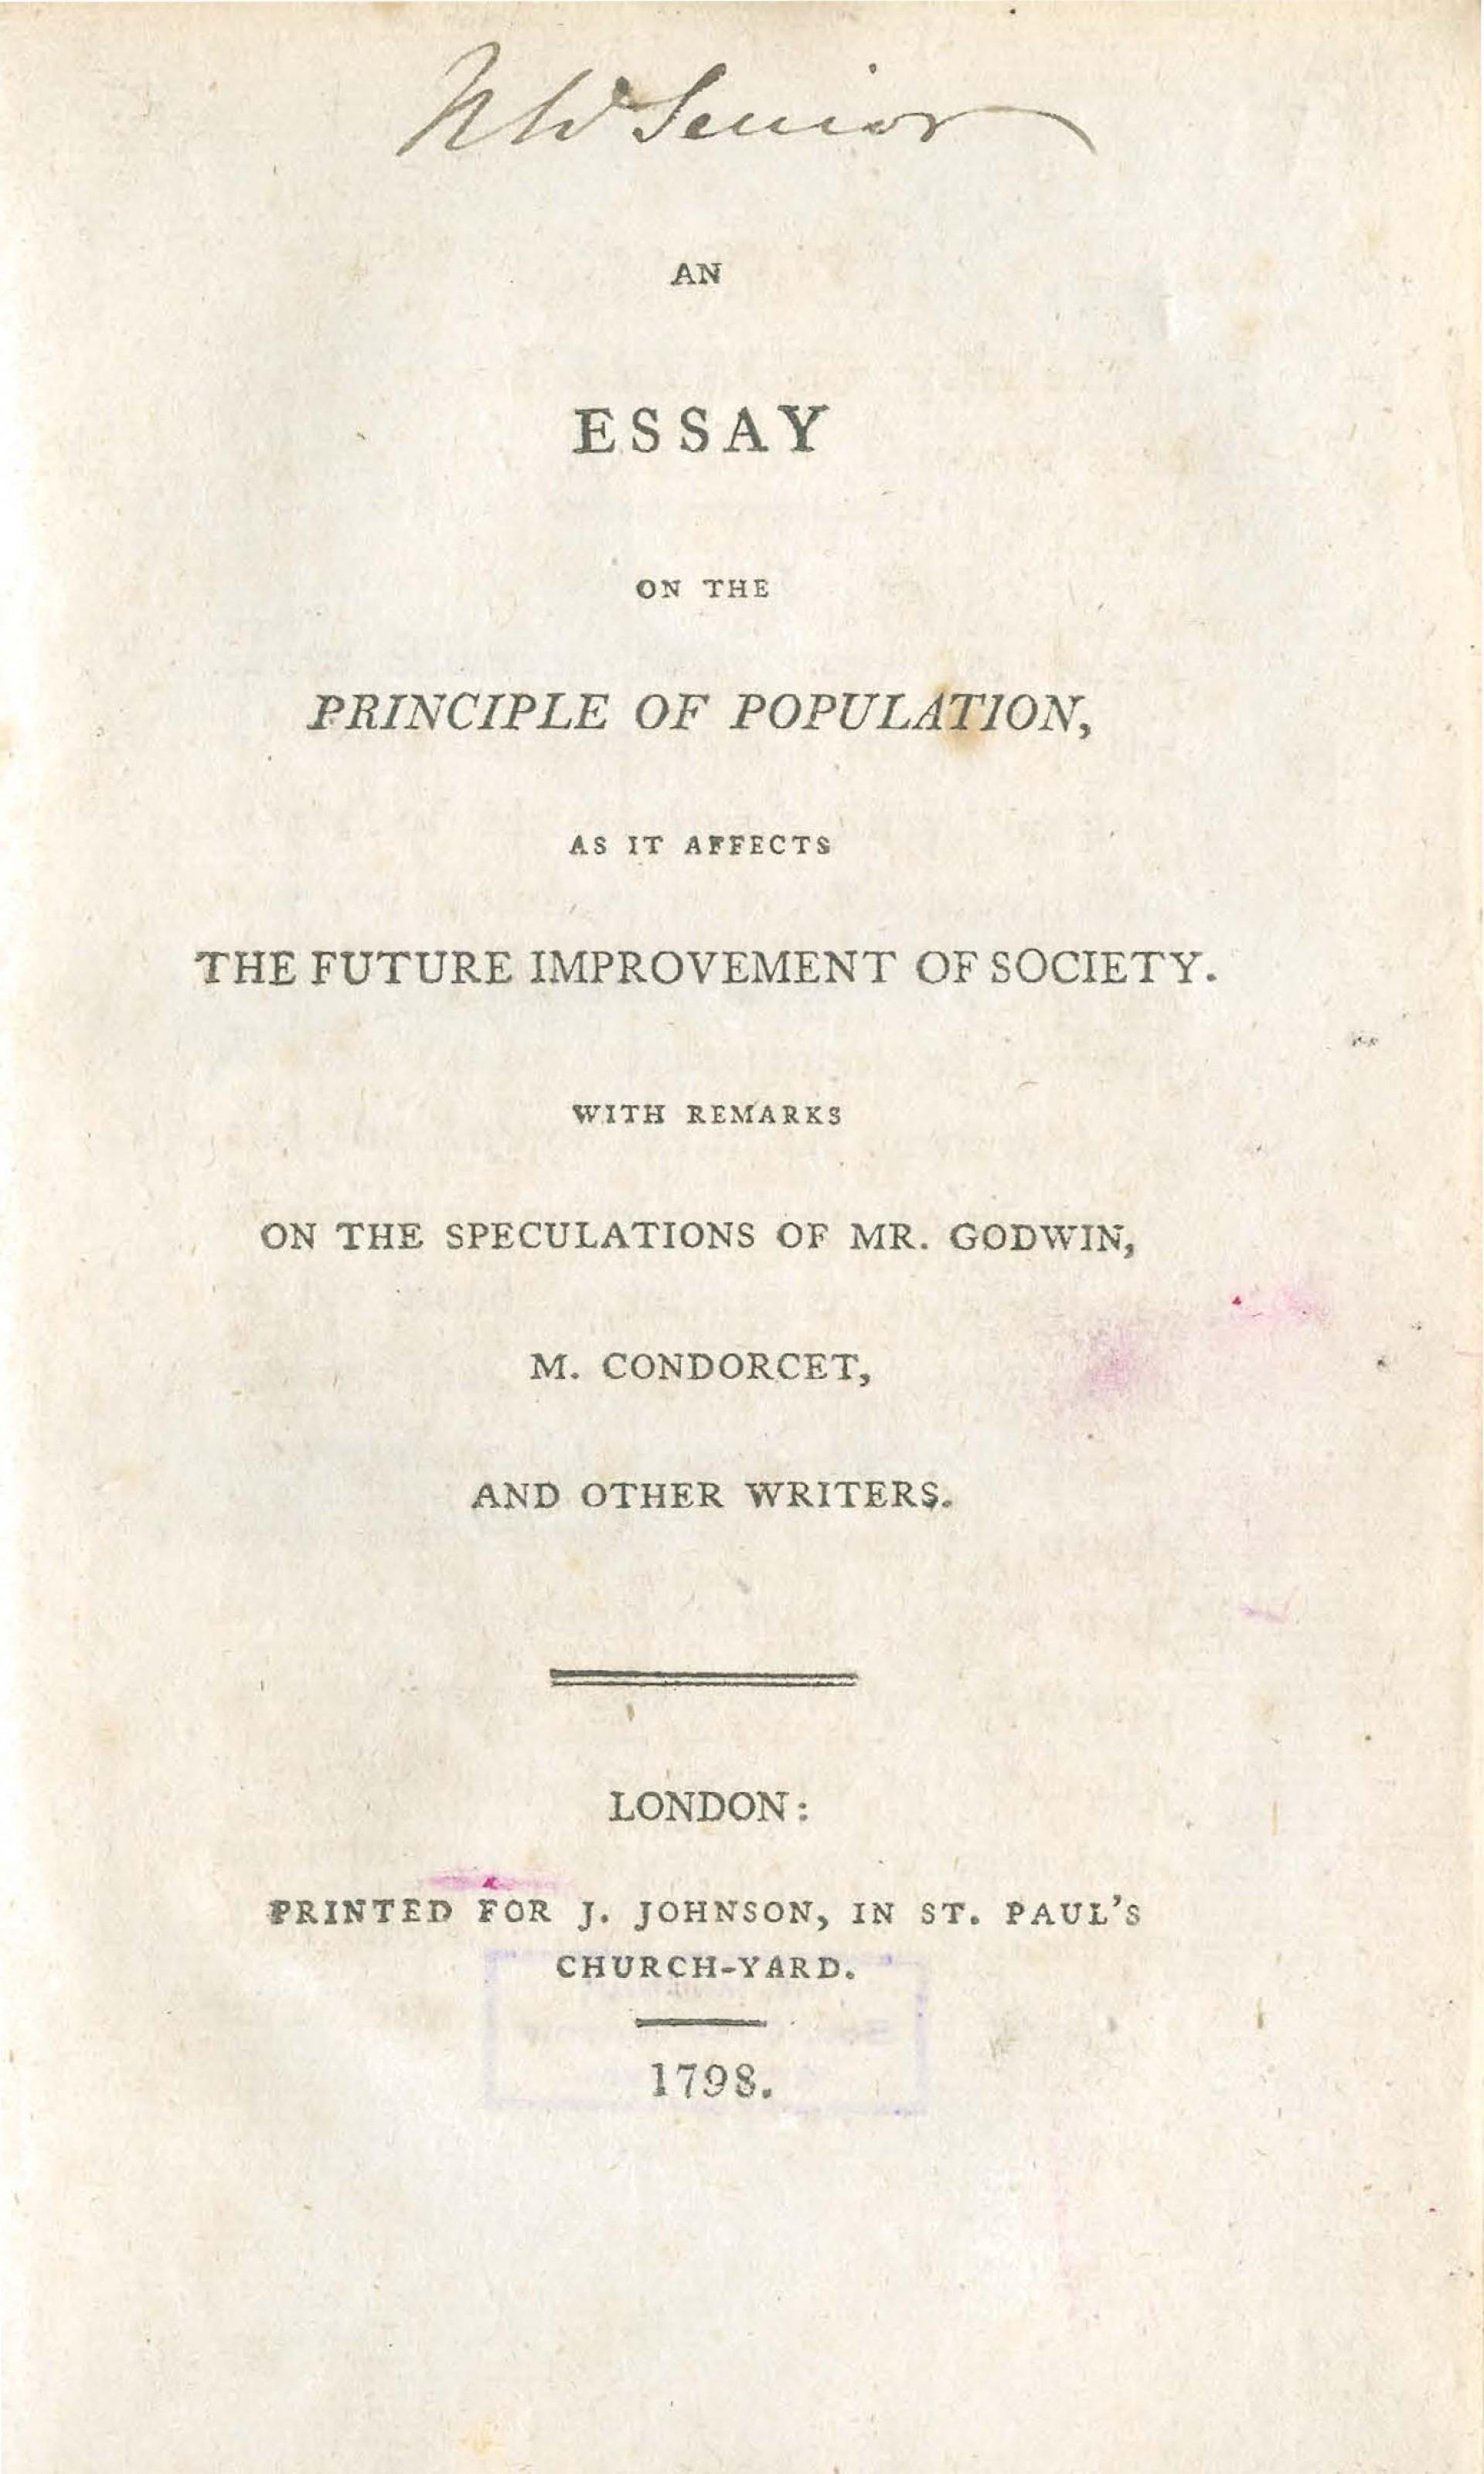 001 Thomas Malthus Essay On The Principle Of Population Stupendous After Reading Malthus's Principles Darwin Got Idea That Ap Euro 1920